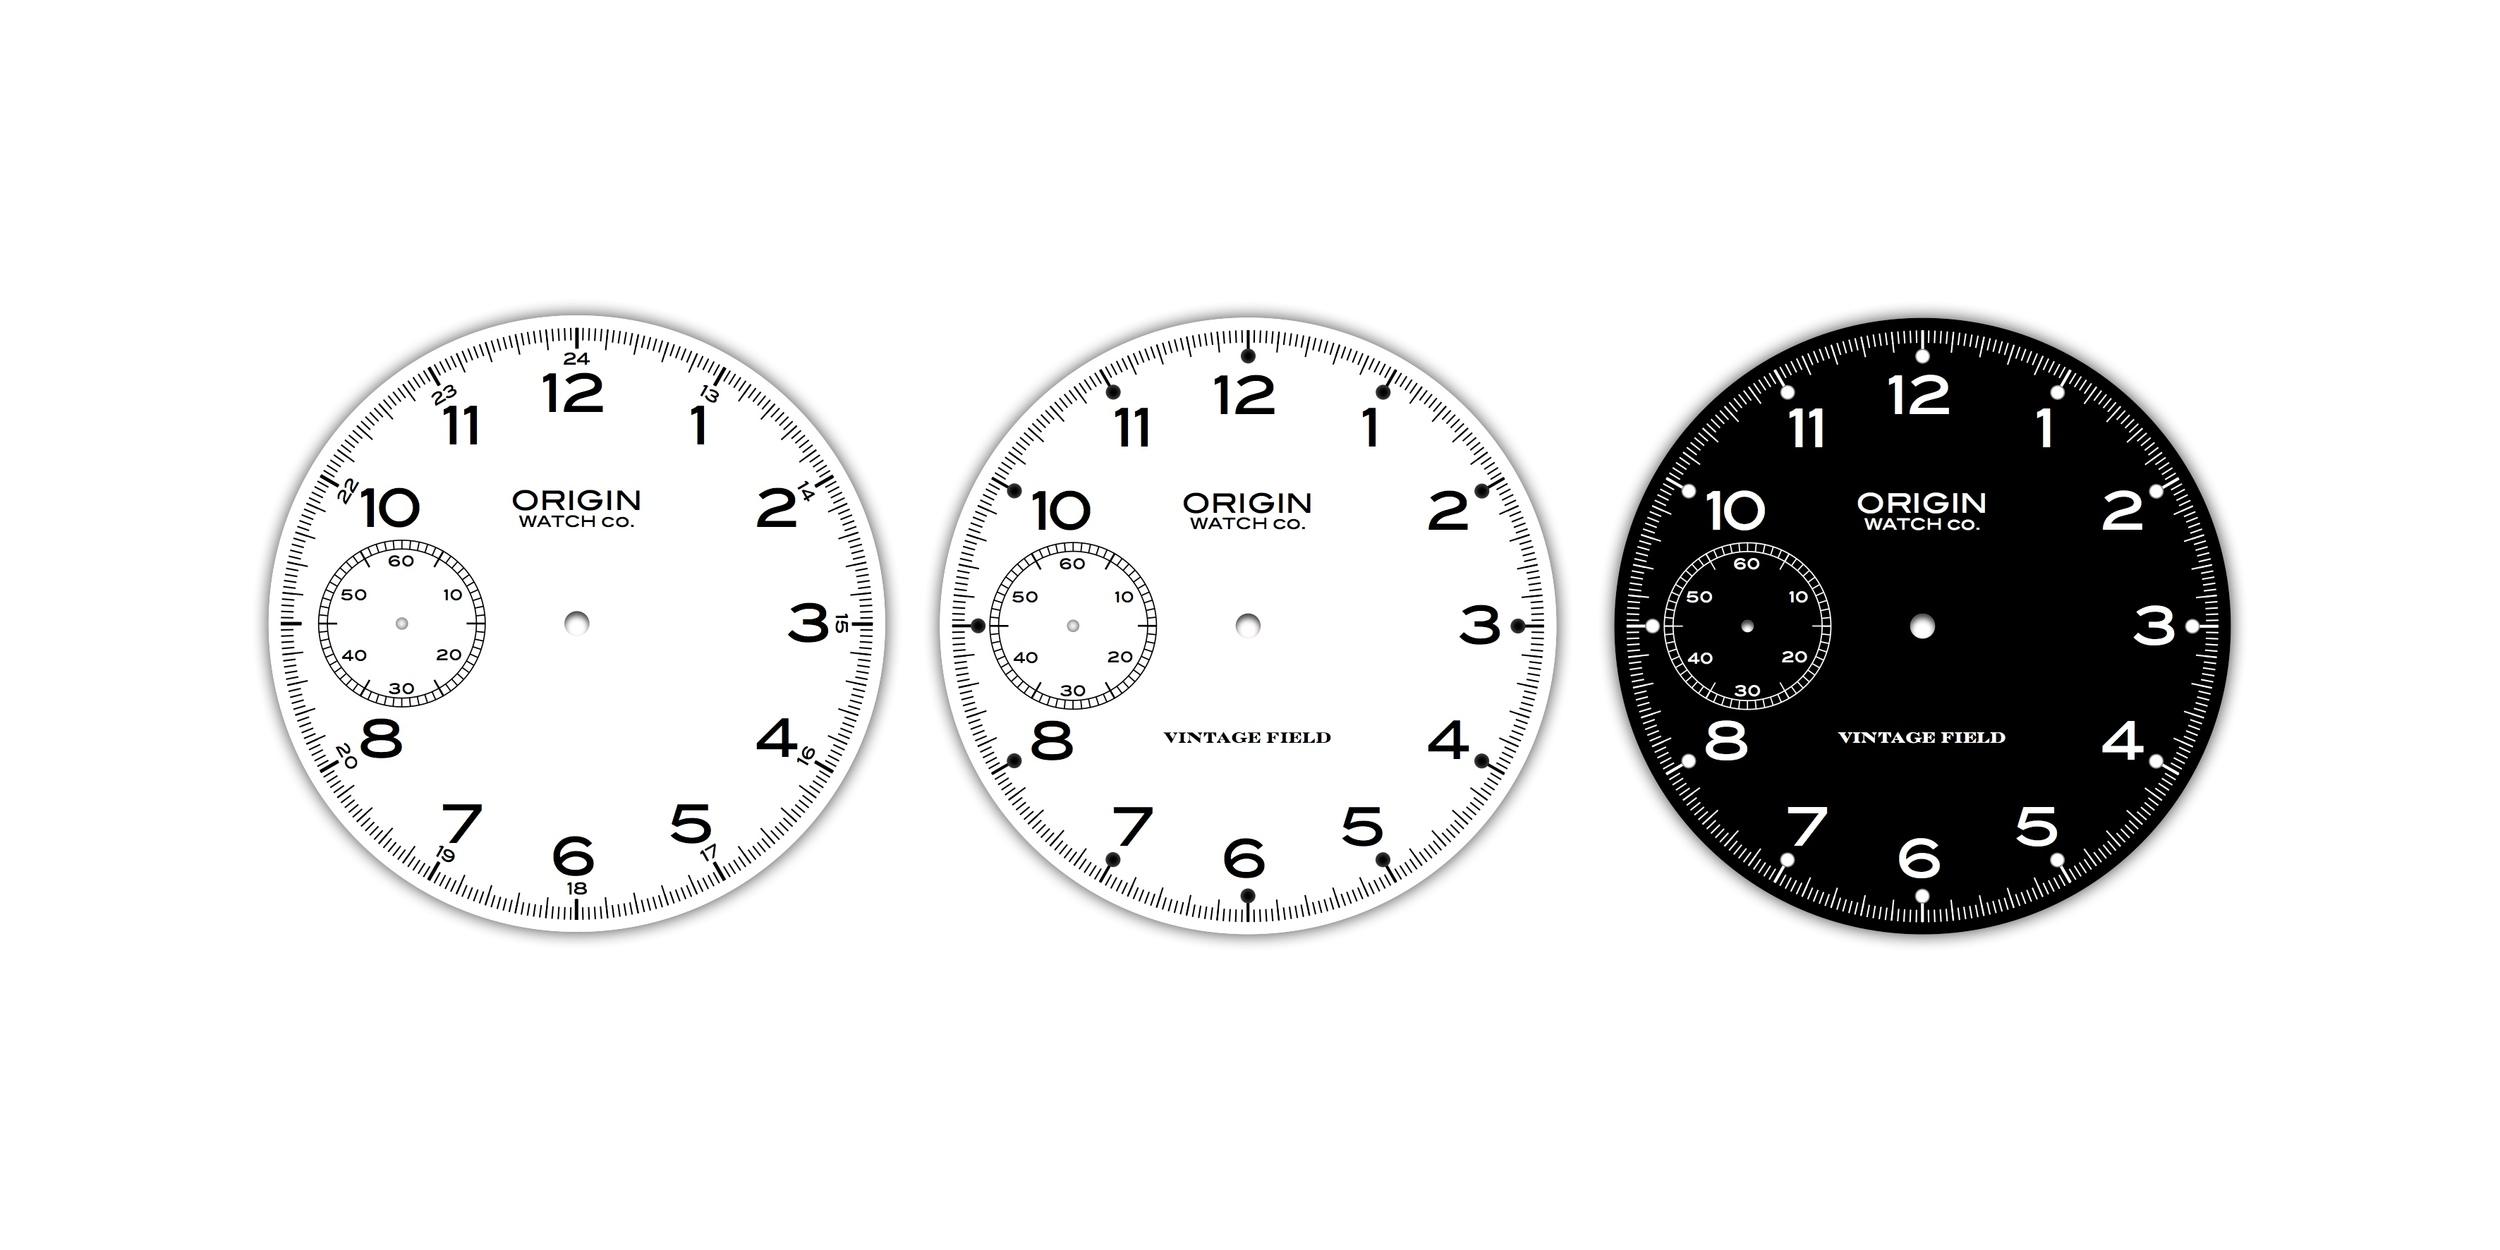 Vintage Field Watch New Dial Designs